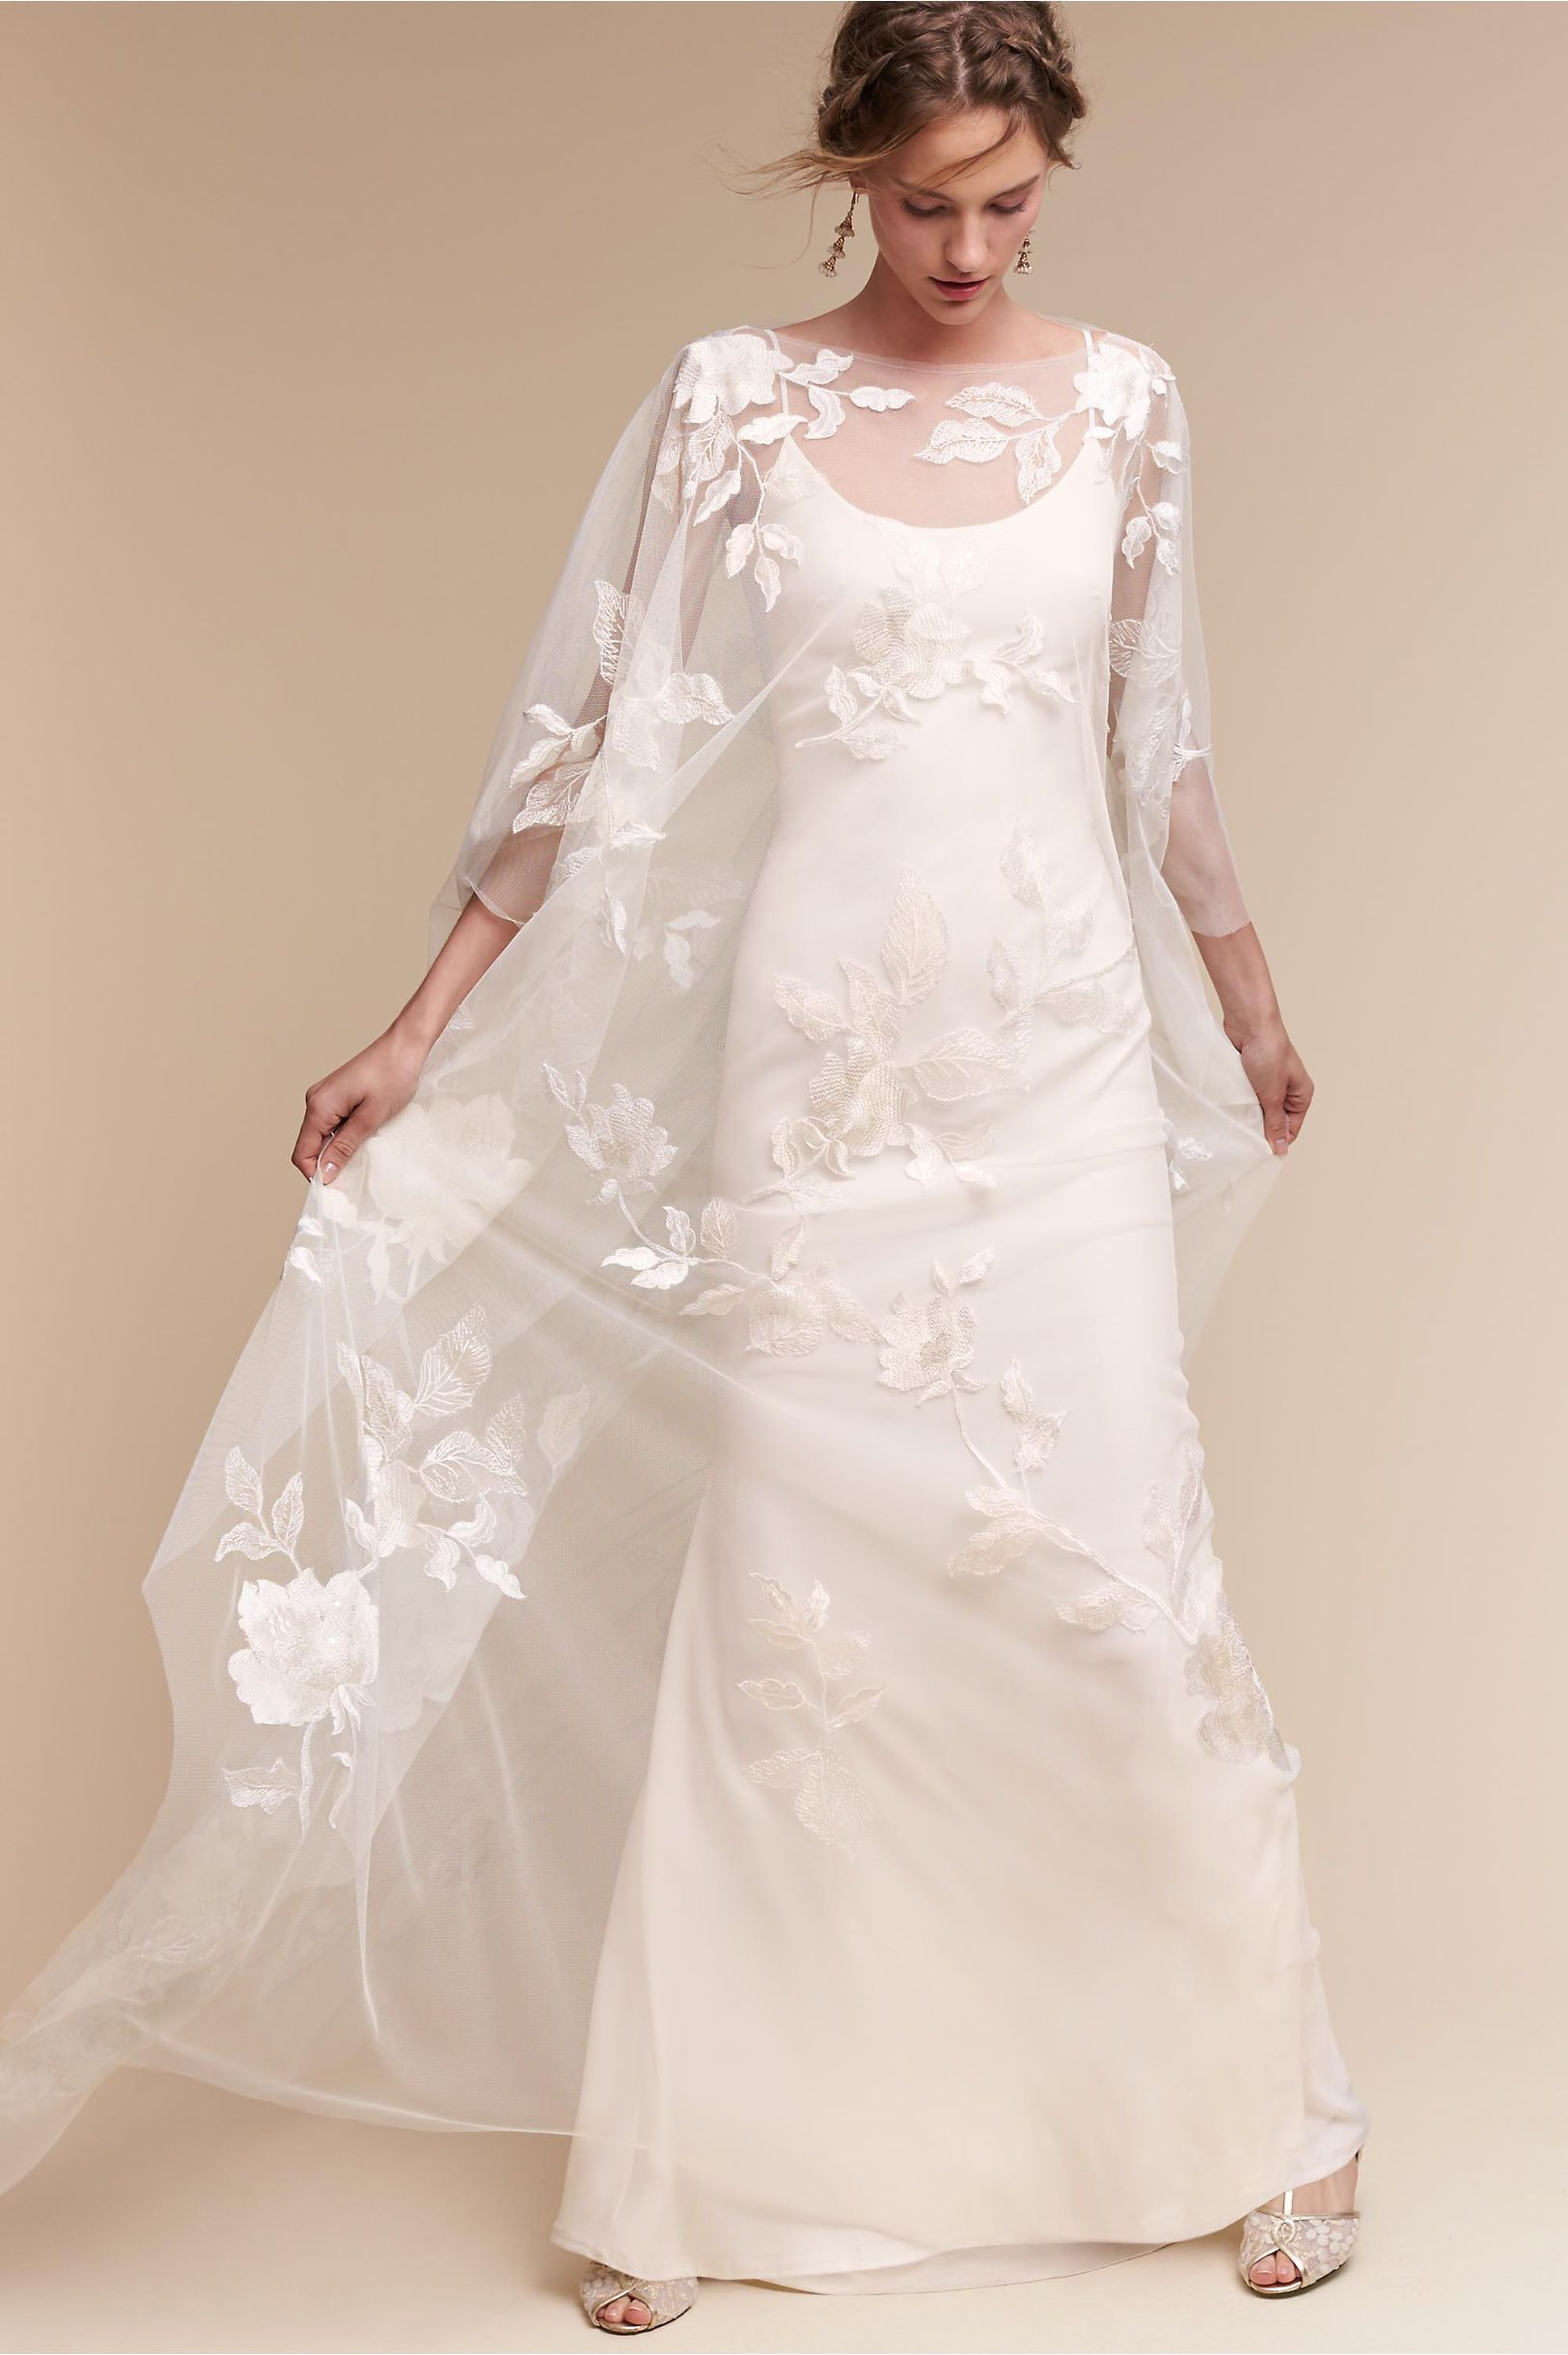 Wedding dress runaway bride  BHLDN Monroe Gown in Bride Wedding Dresses  BHLDN  white dress